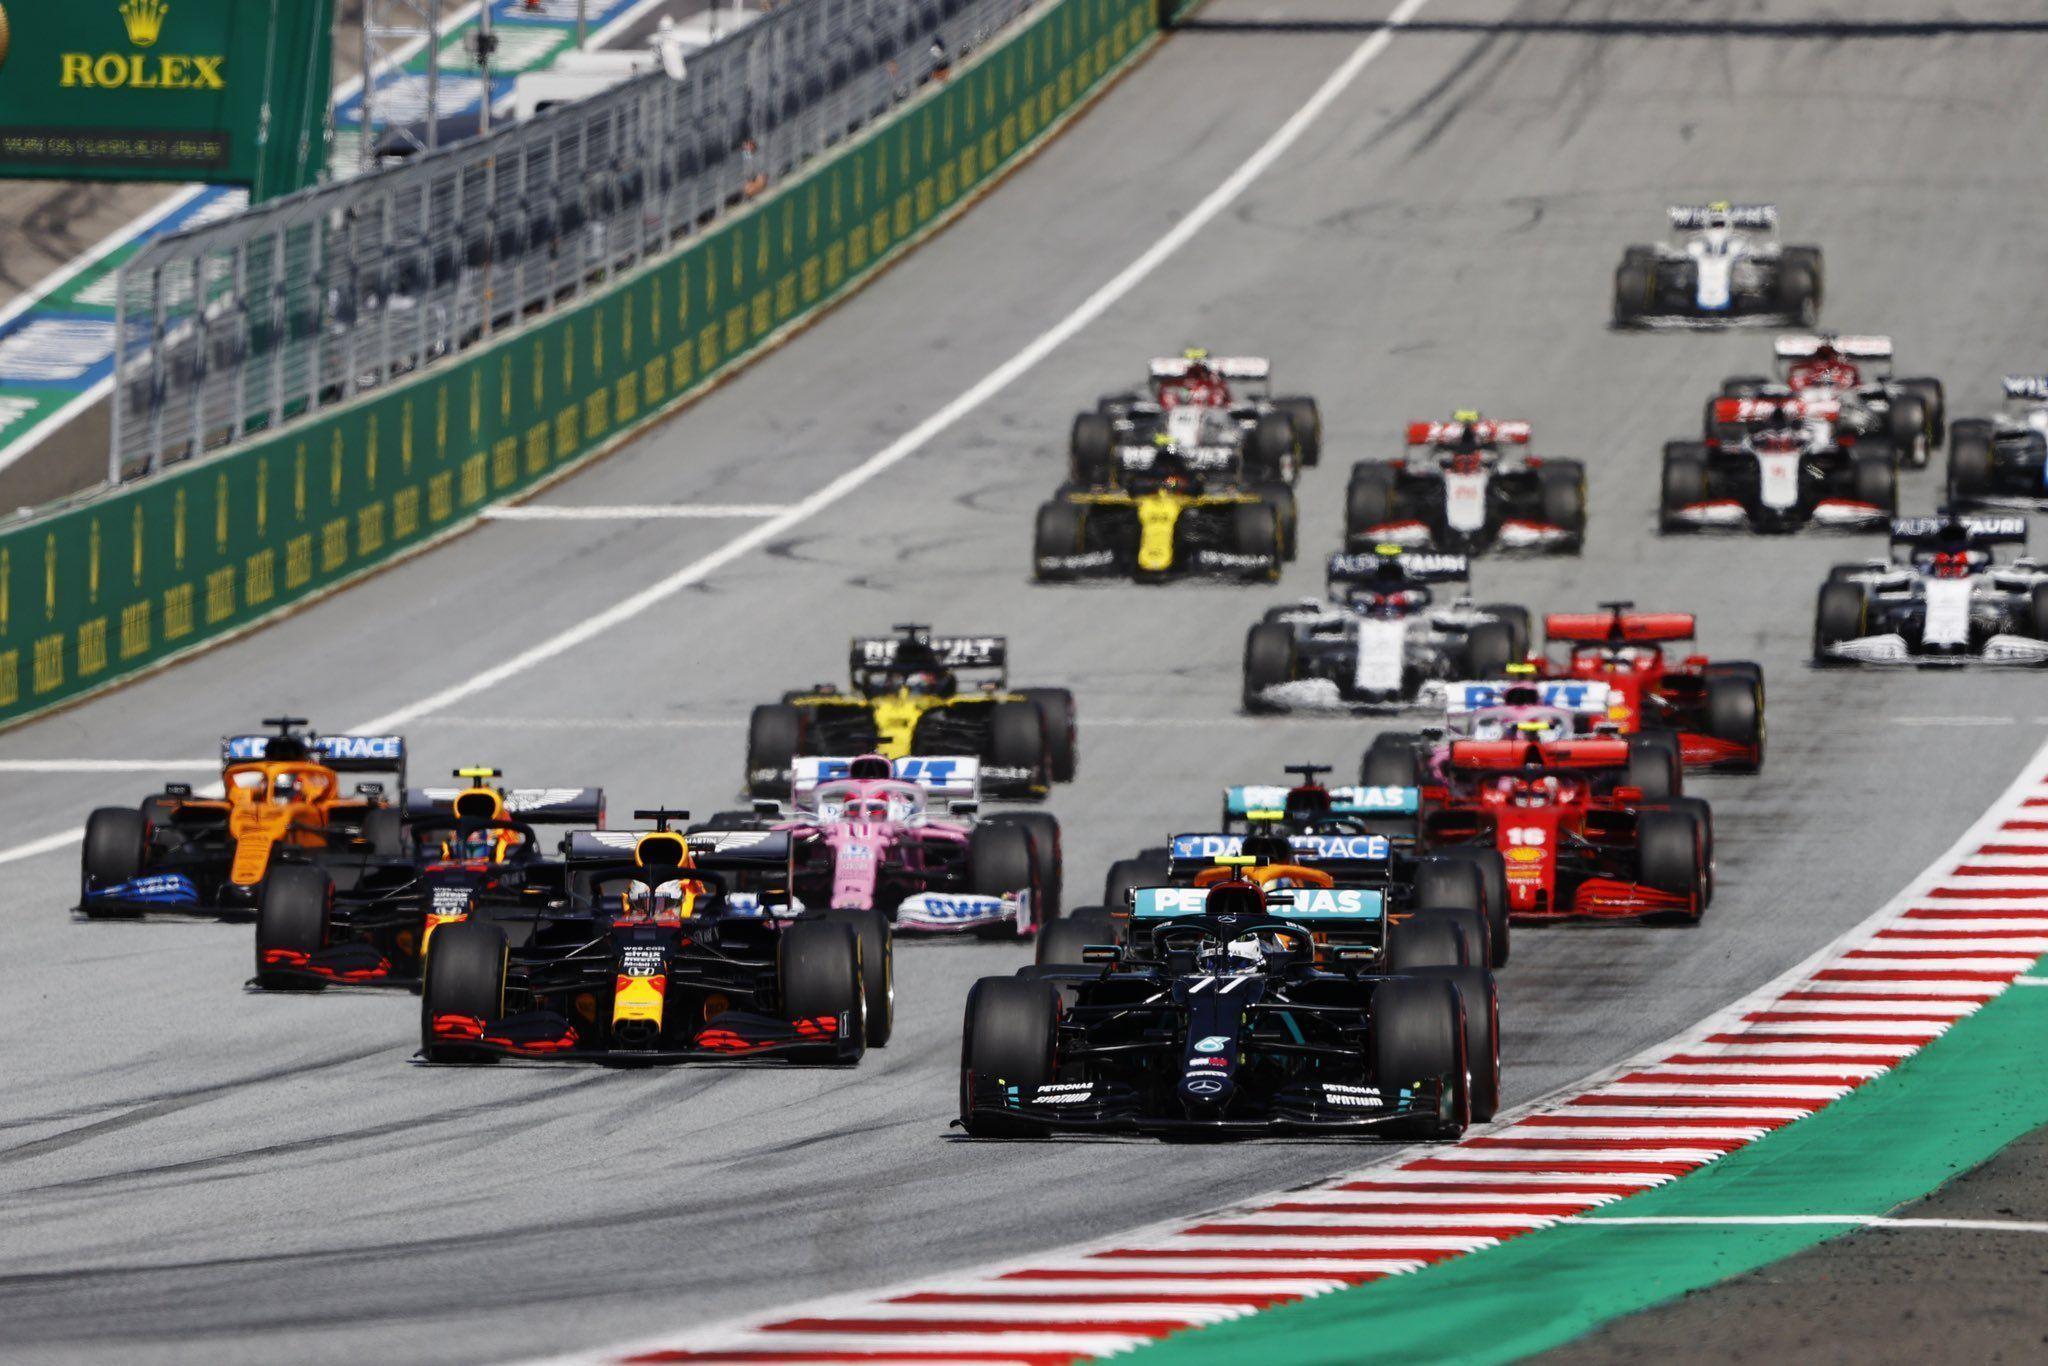 Austrian GP, Valtteri Bottas, F1